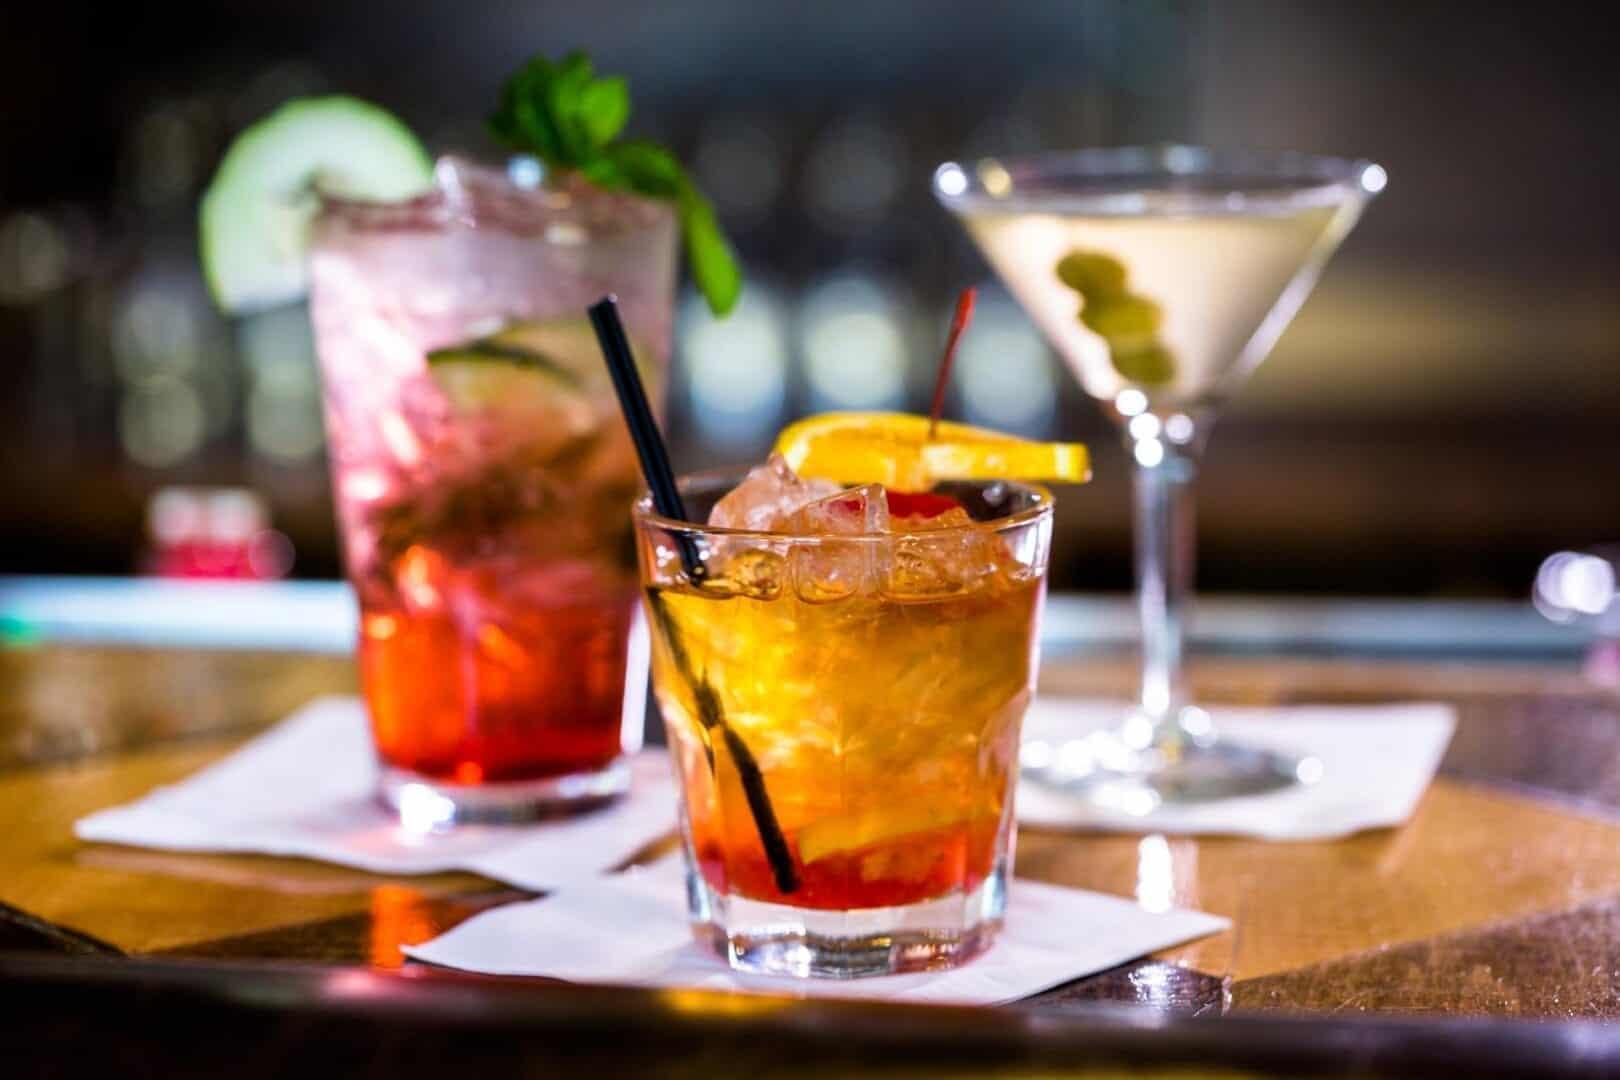 Drinks - 3 Close Up